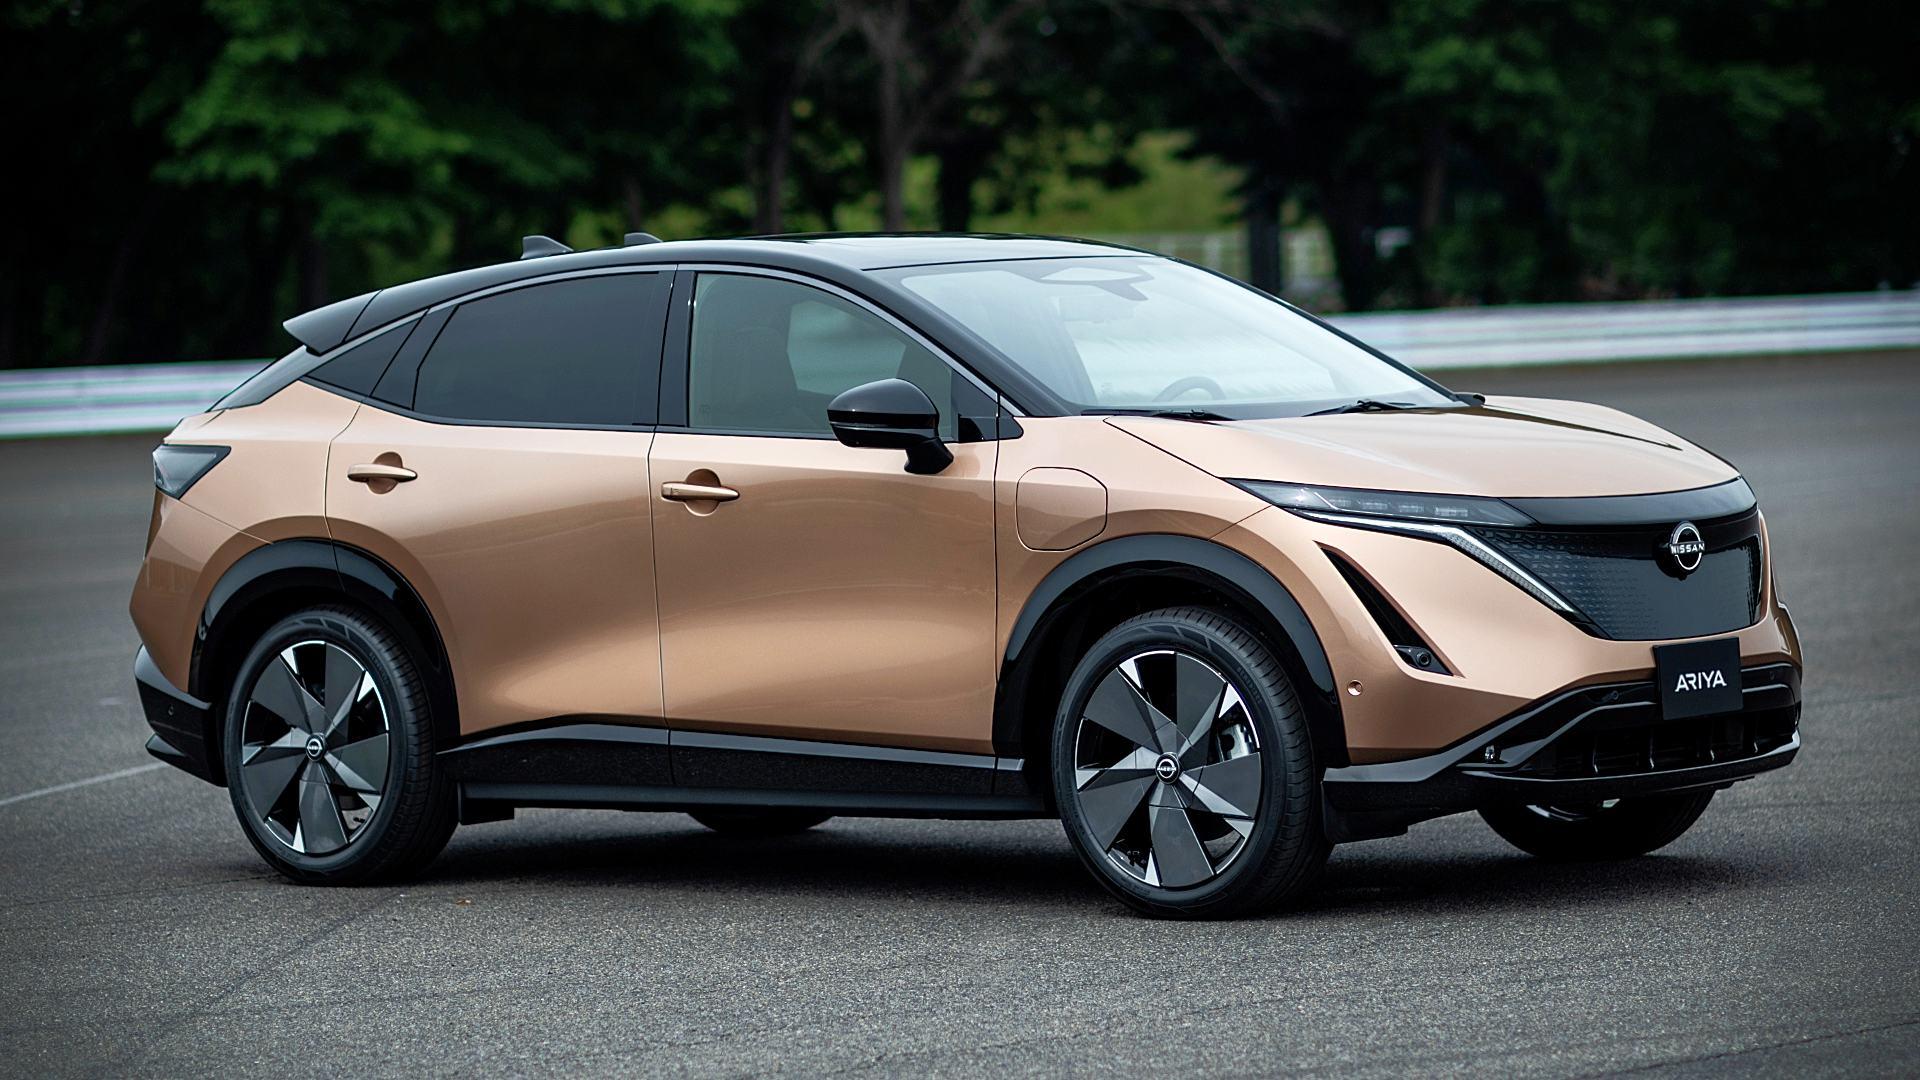 2021 Nissan Ariya 1